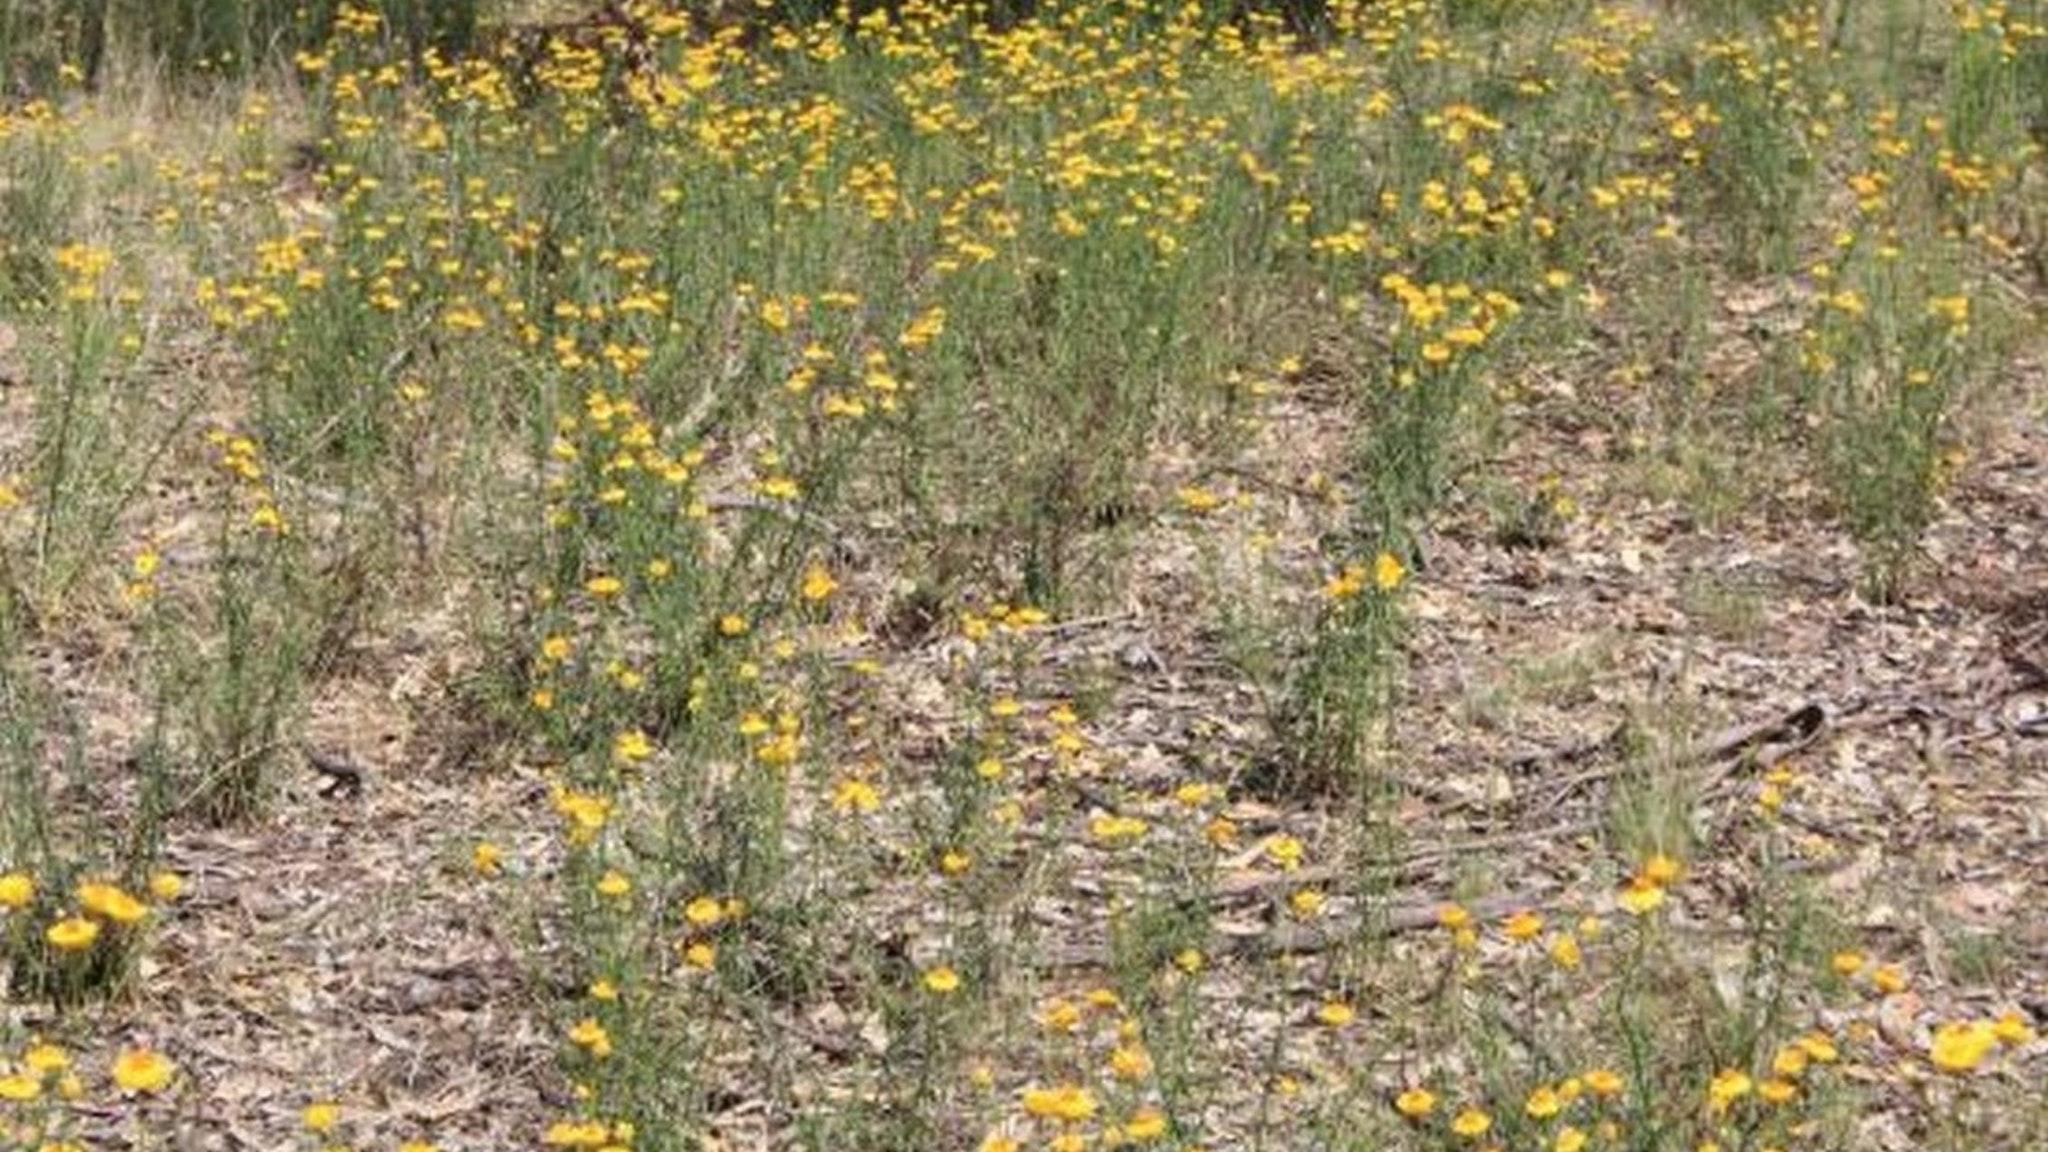 Rushworth Wildflower Hunt